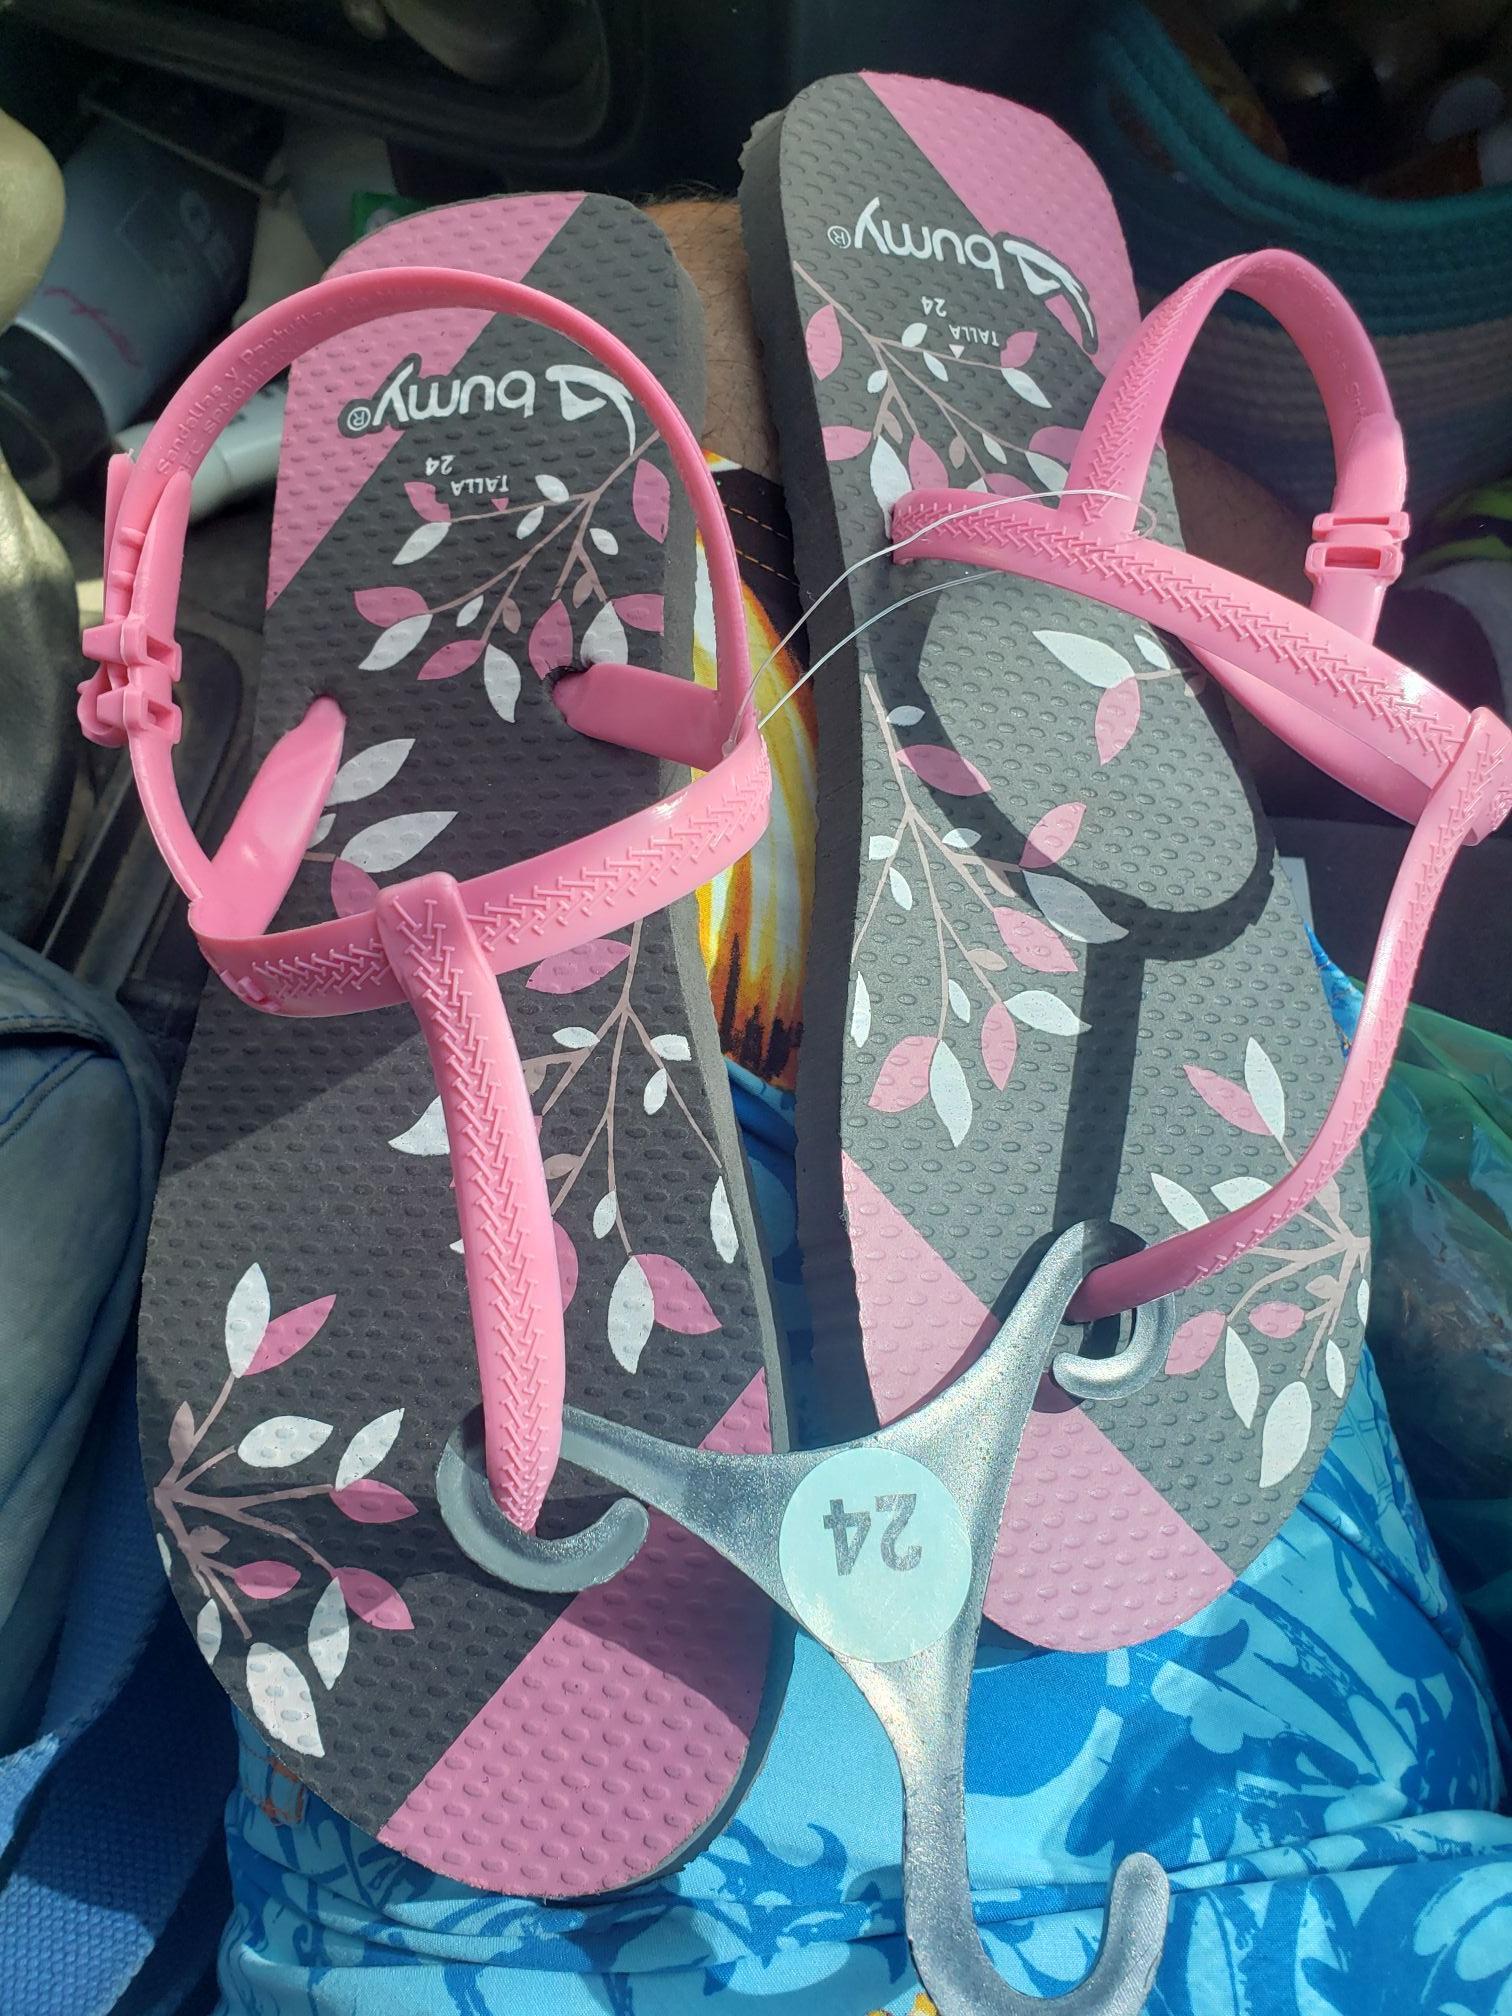 Walmart sandalias para dama en $10.01